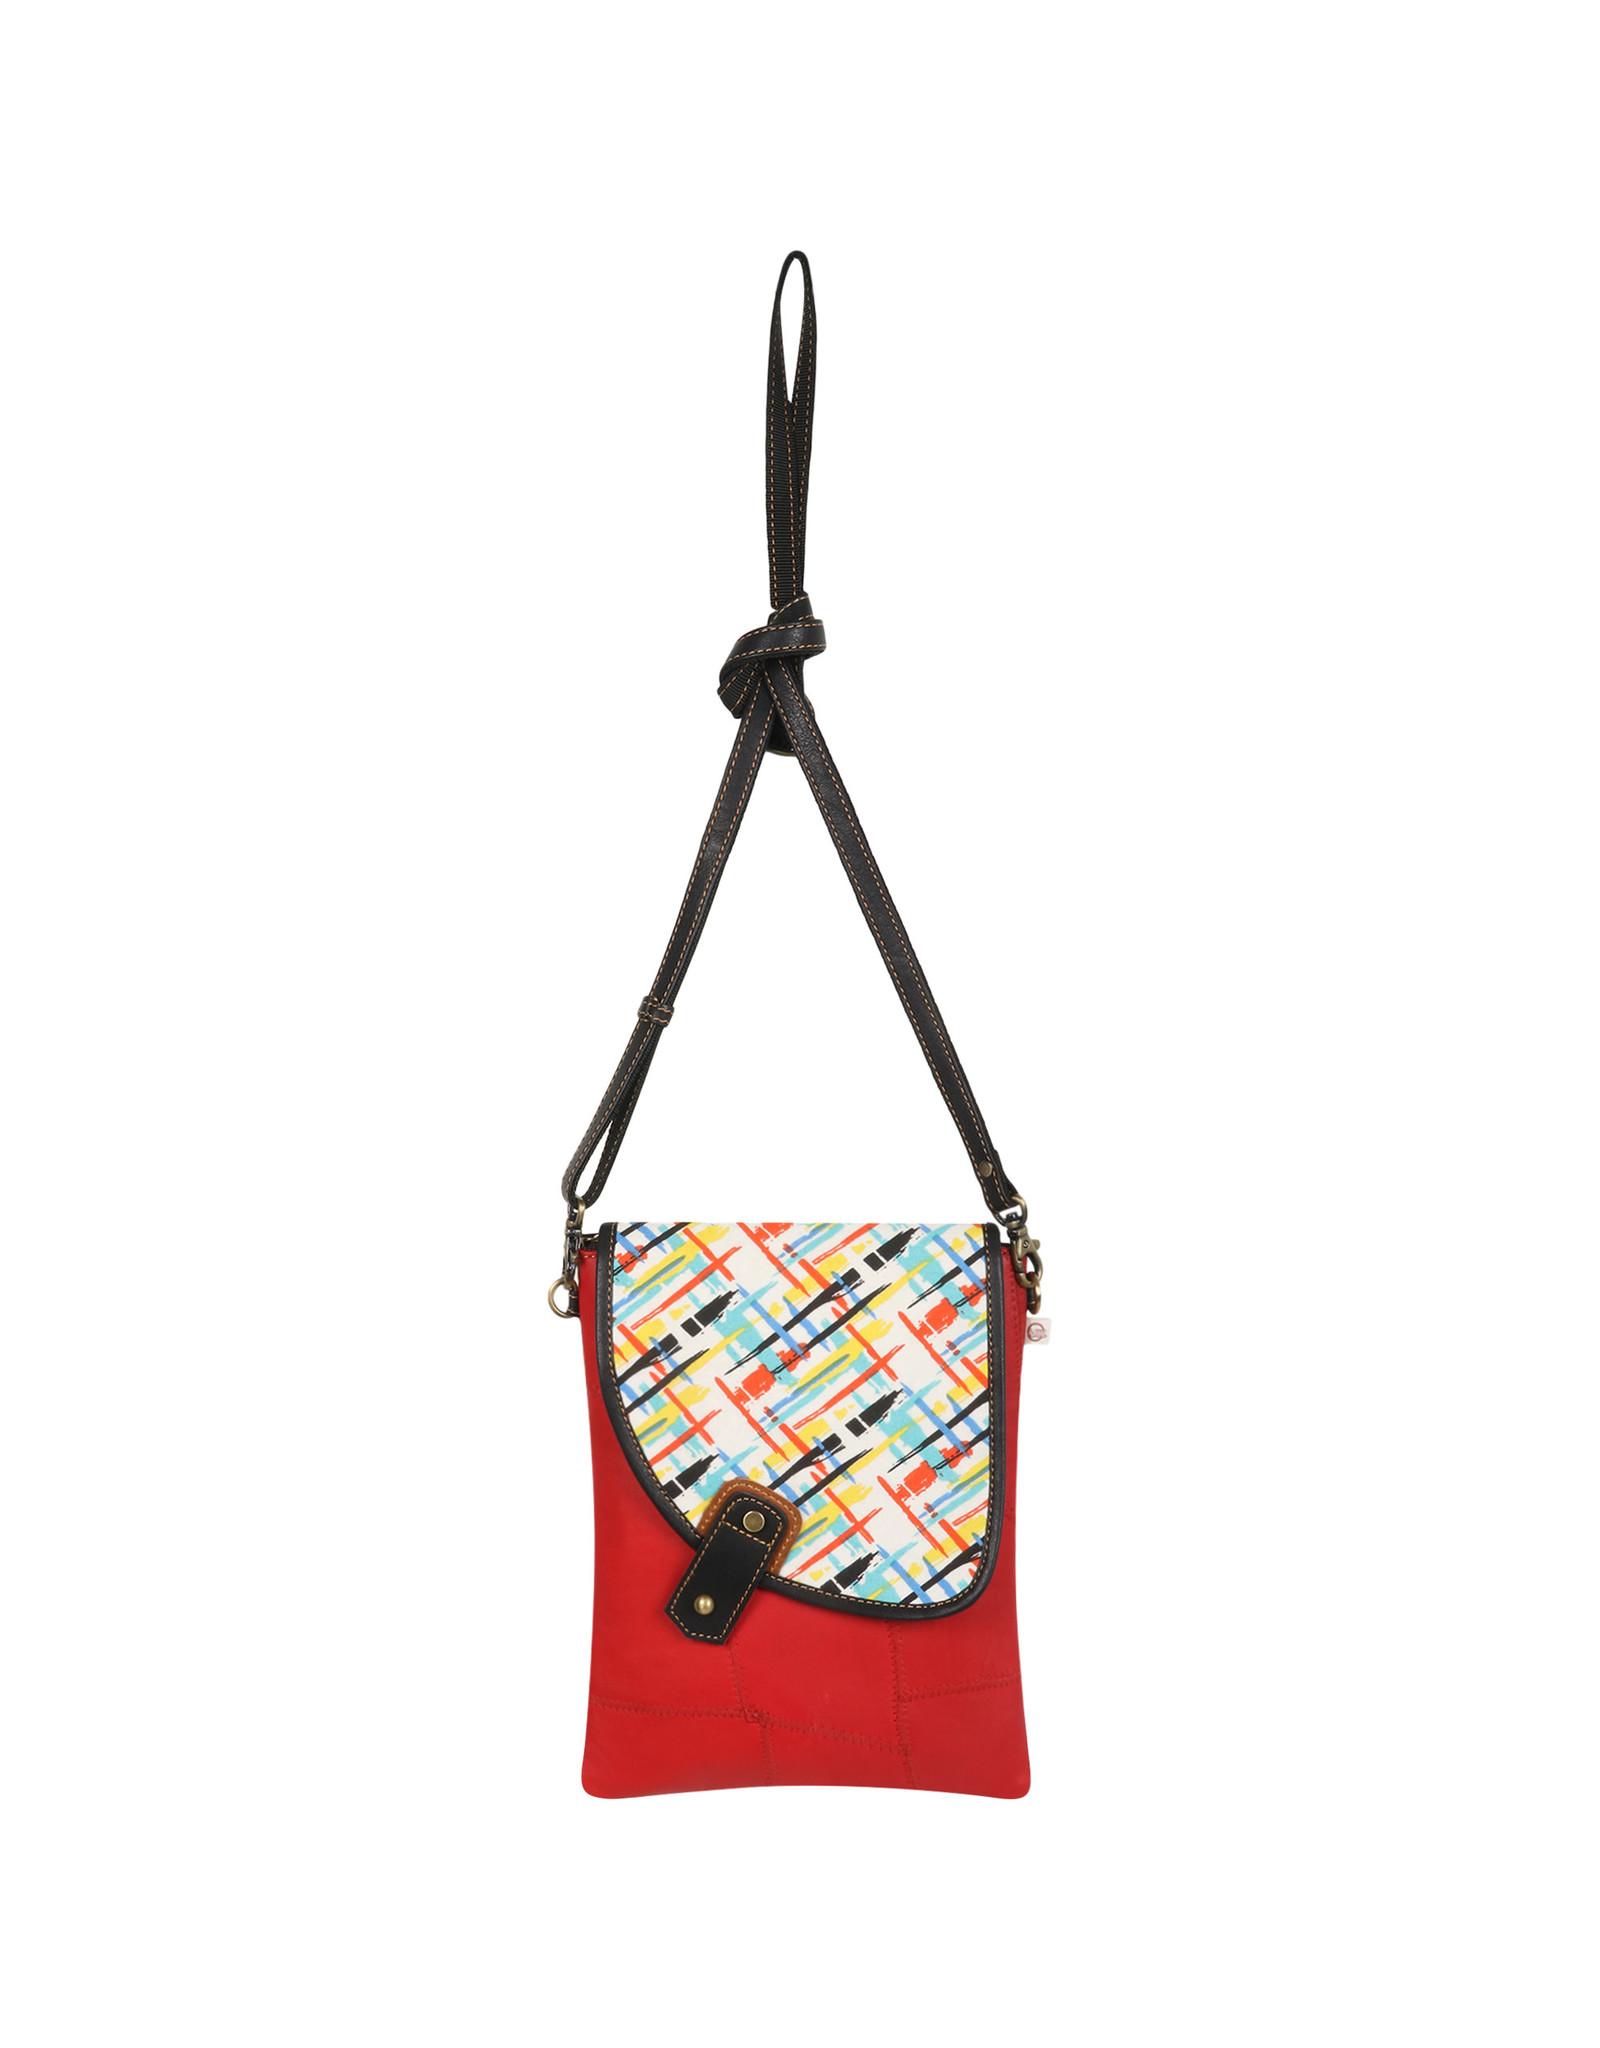 Vann & Co S2V-510 RFID Small Crossbody Bag with Flap